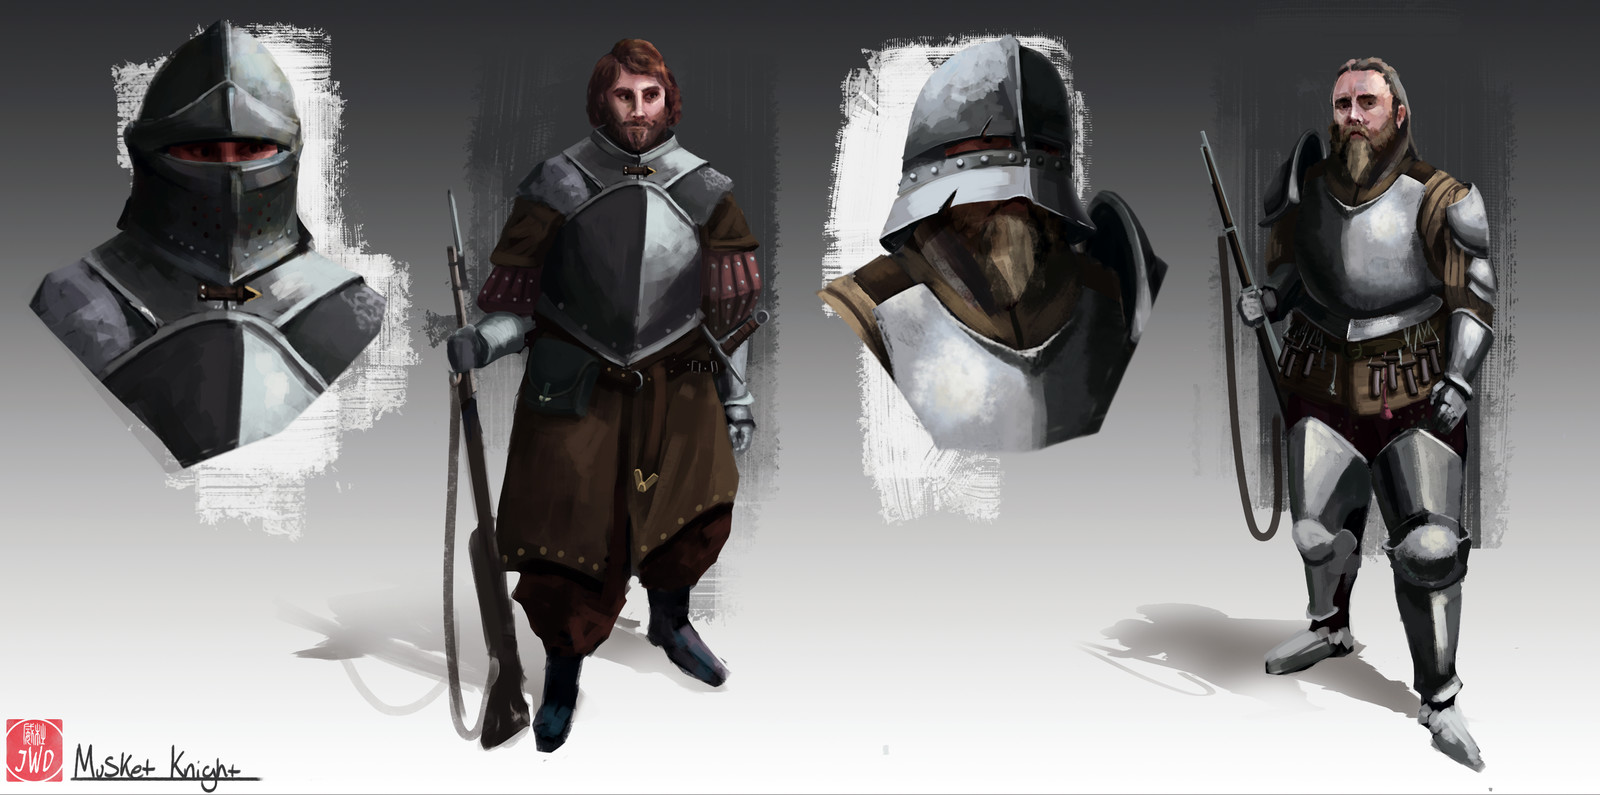 Musket Knight designs